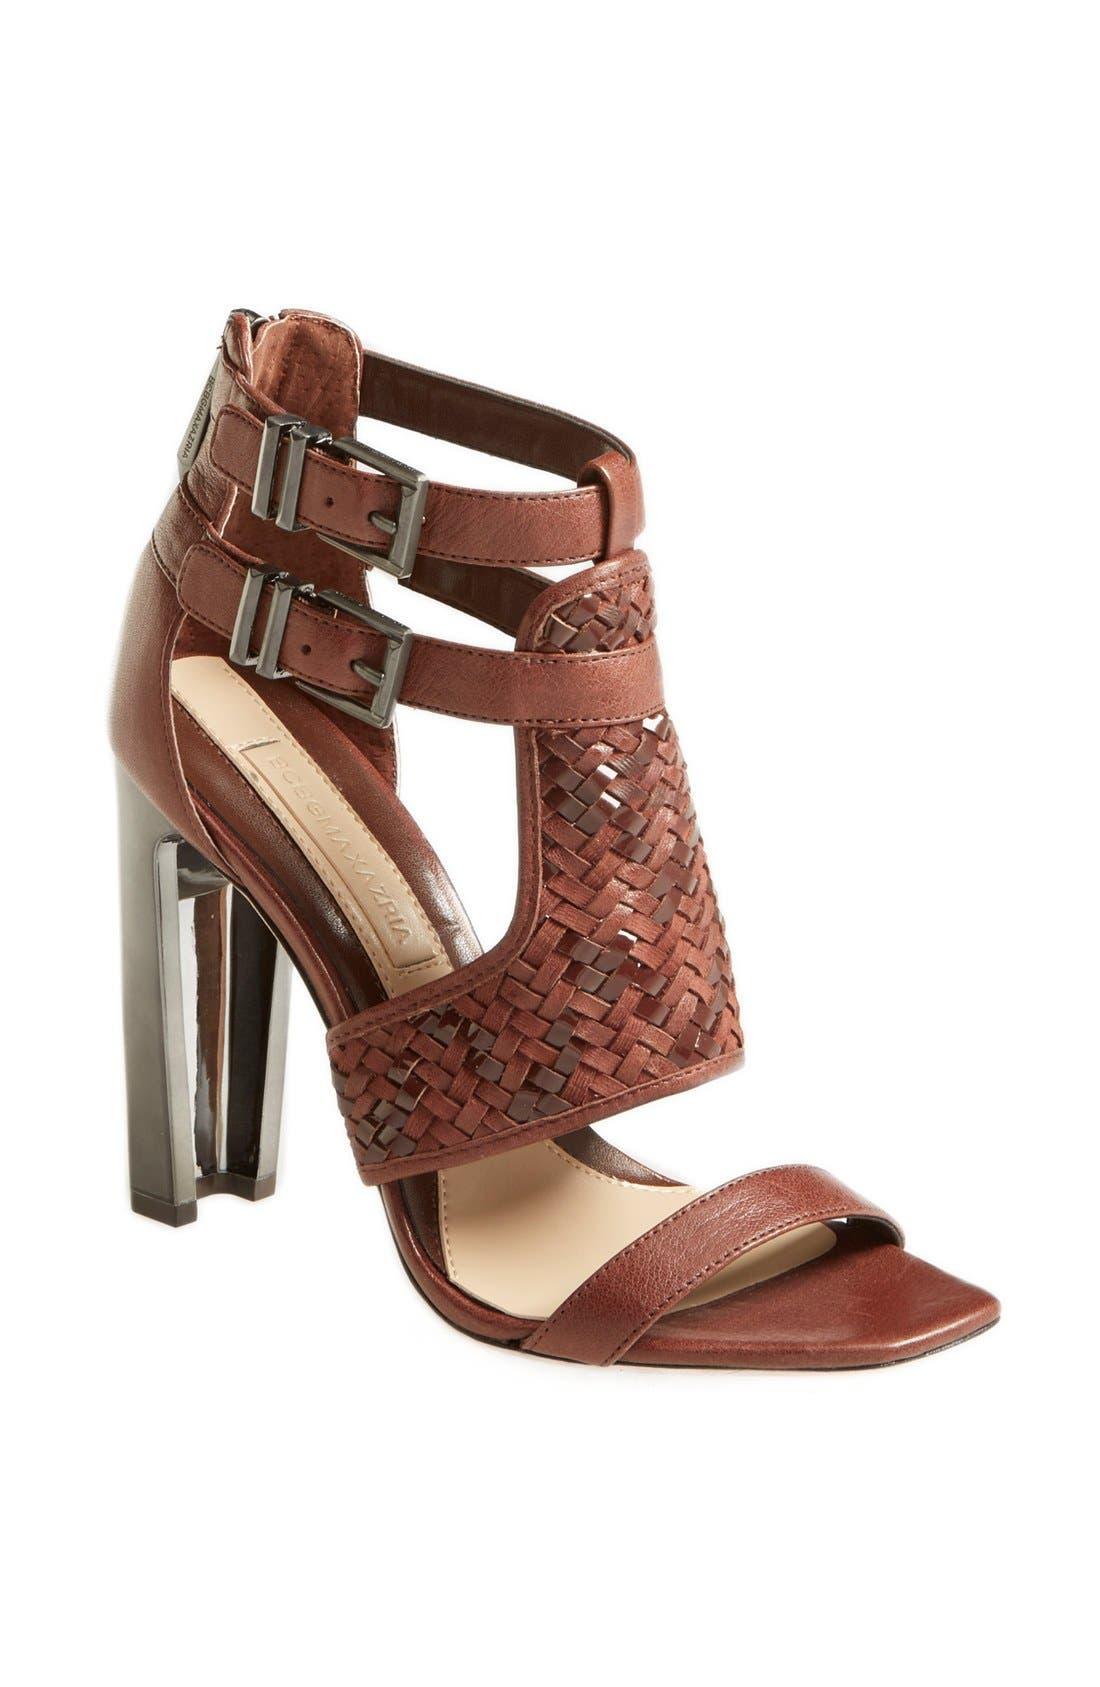 Main Image - BCBGMAXAZRIA 'Pixy' Sandal